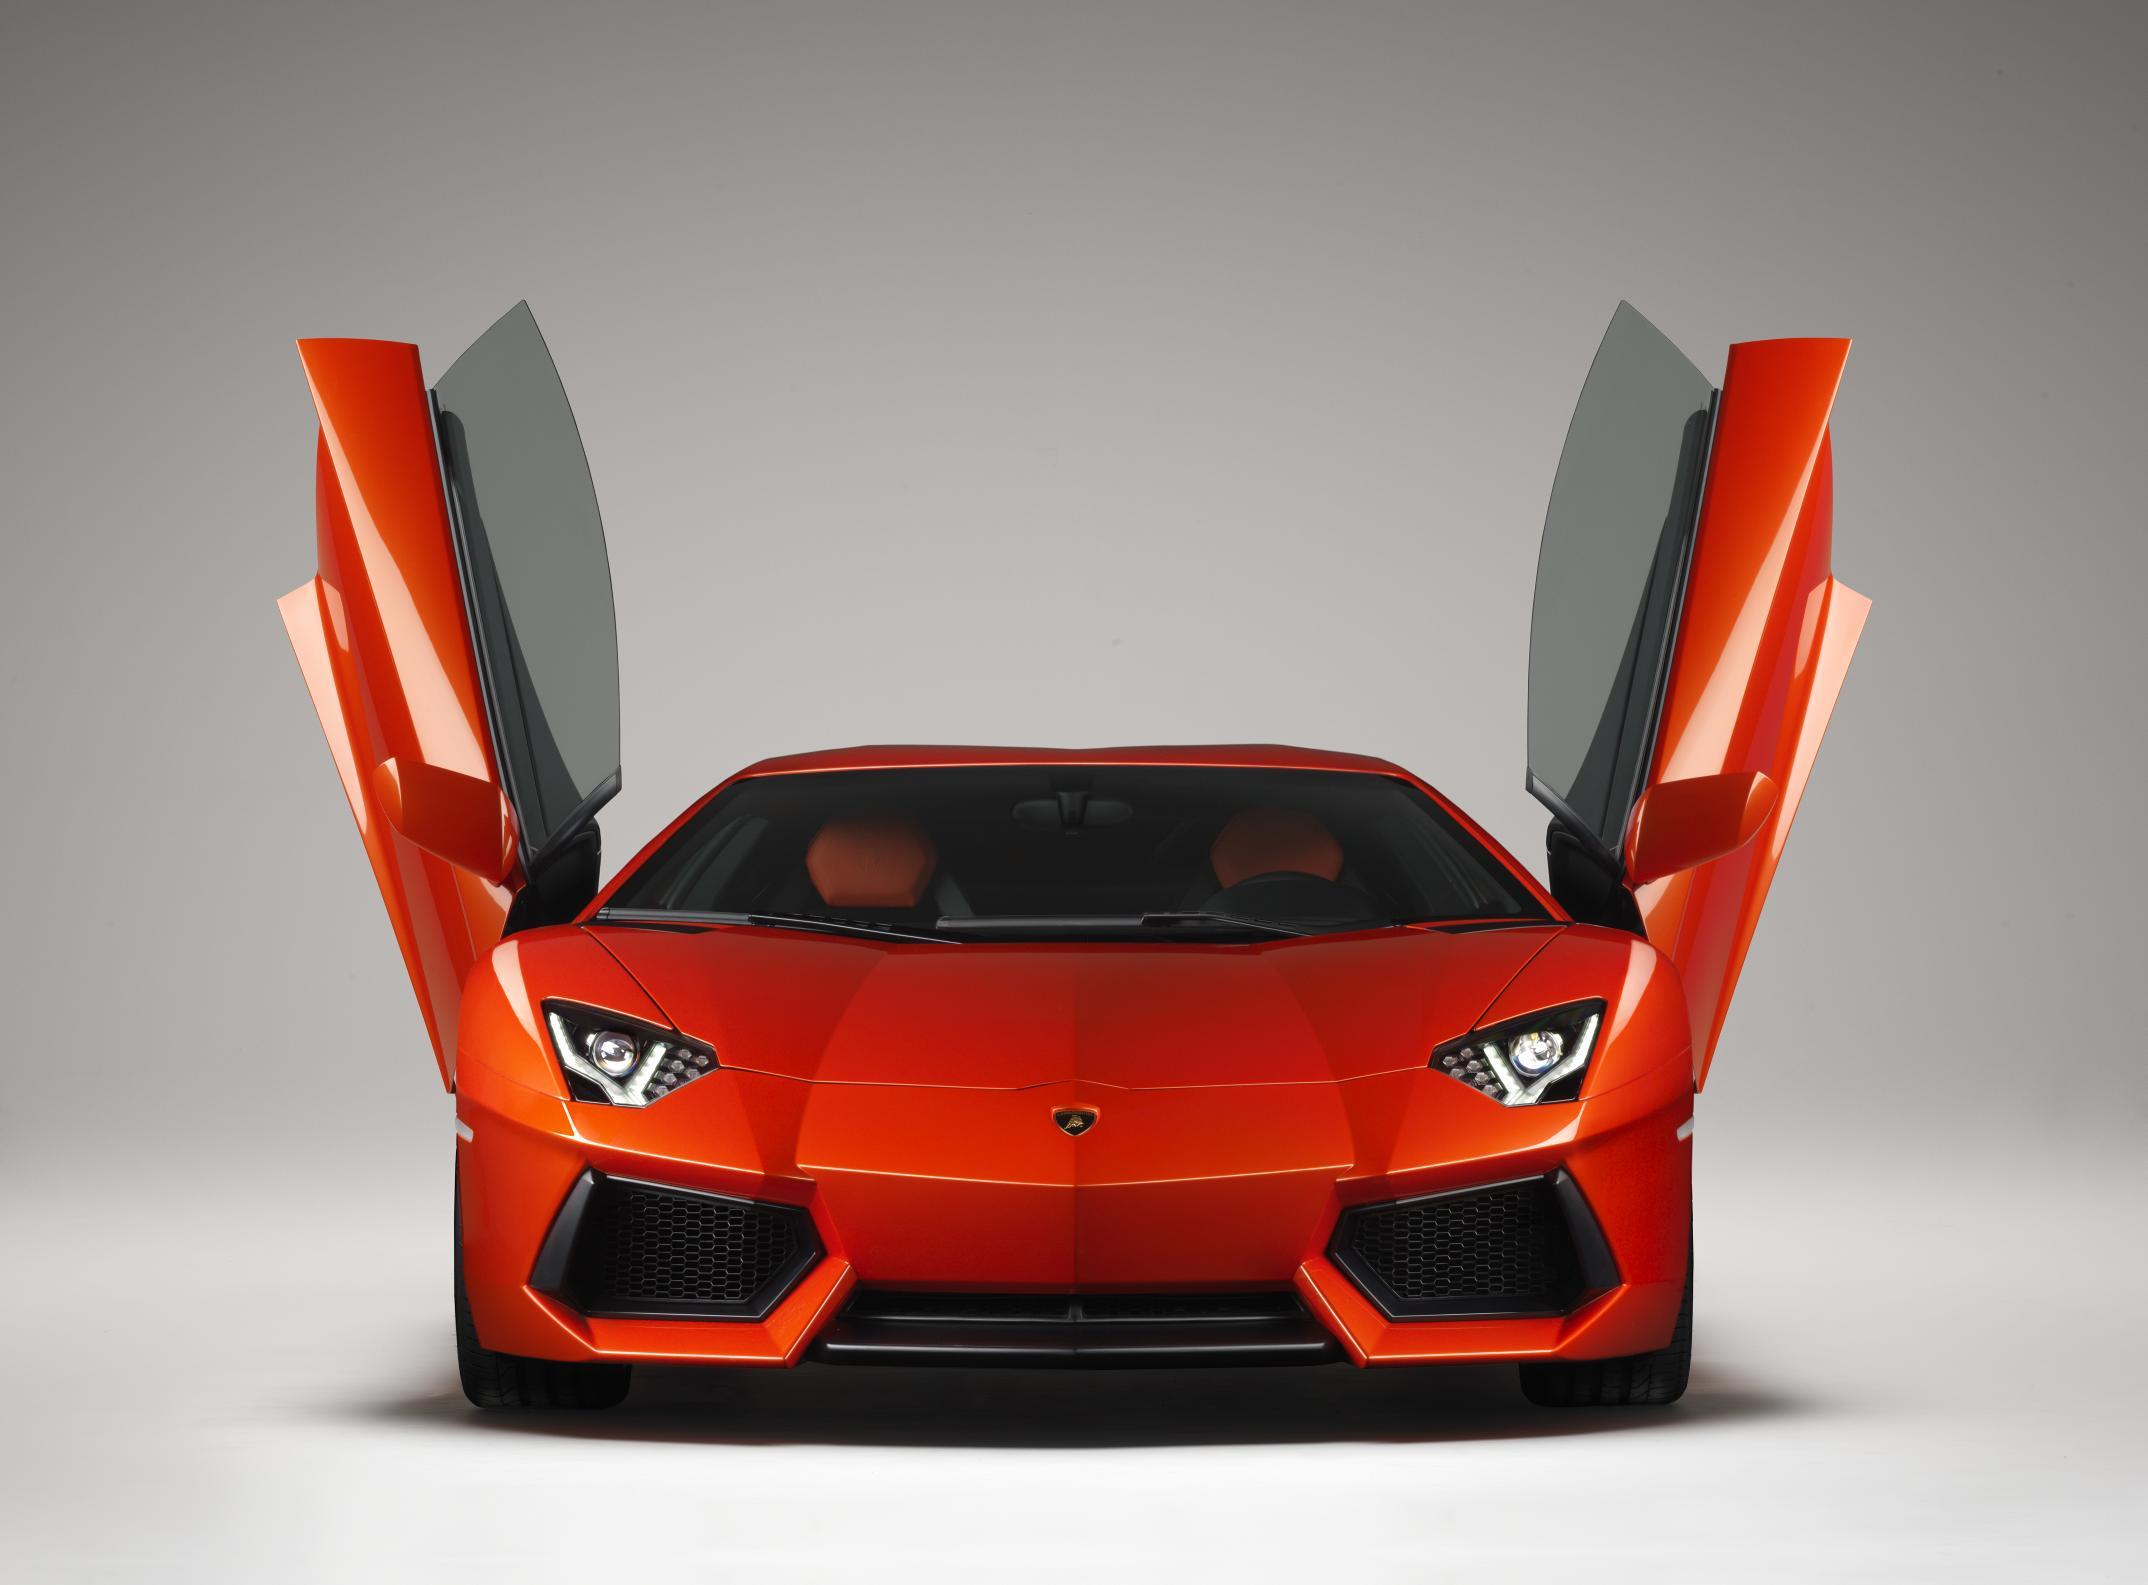 Lamborghini Aventador - The ultimate Mid Life Crisis Machine